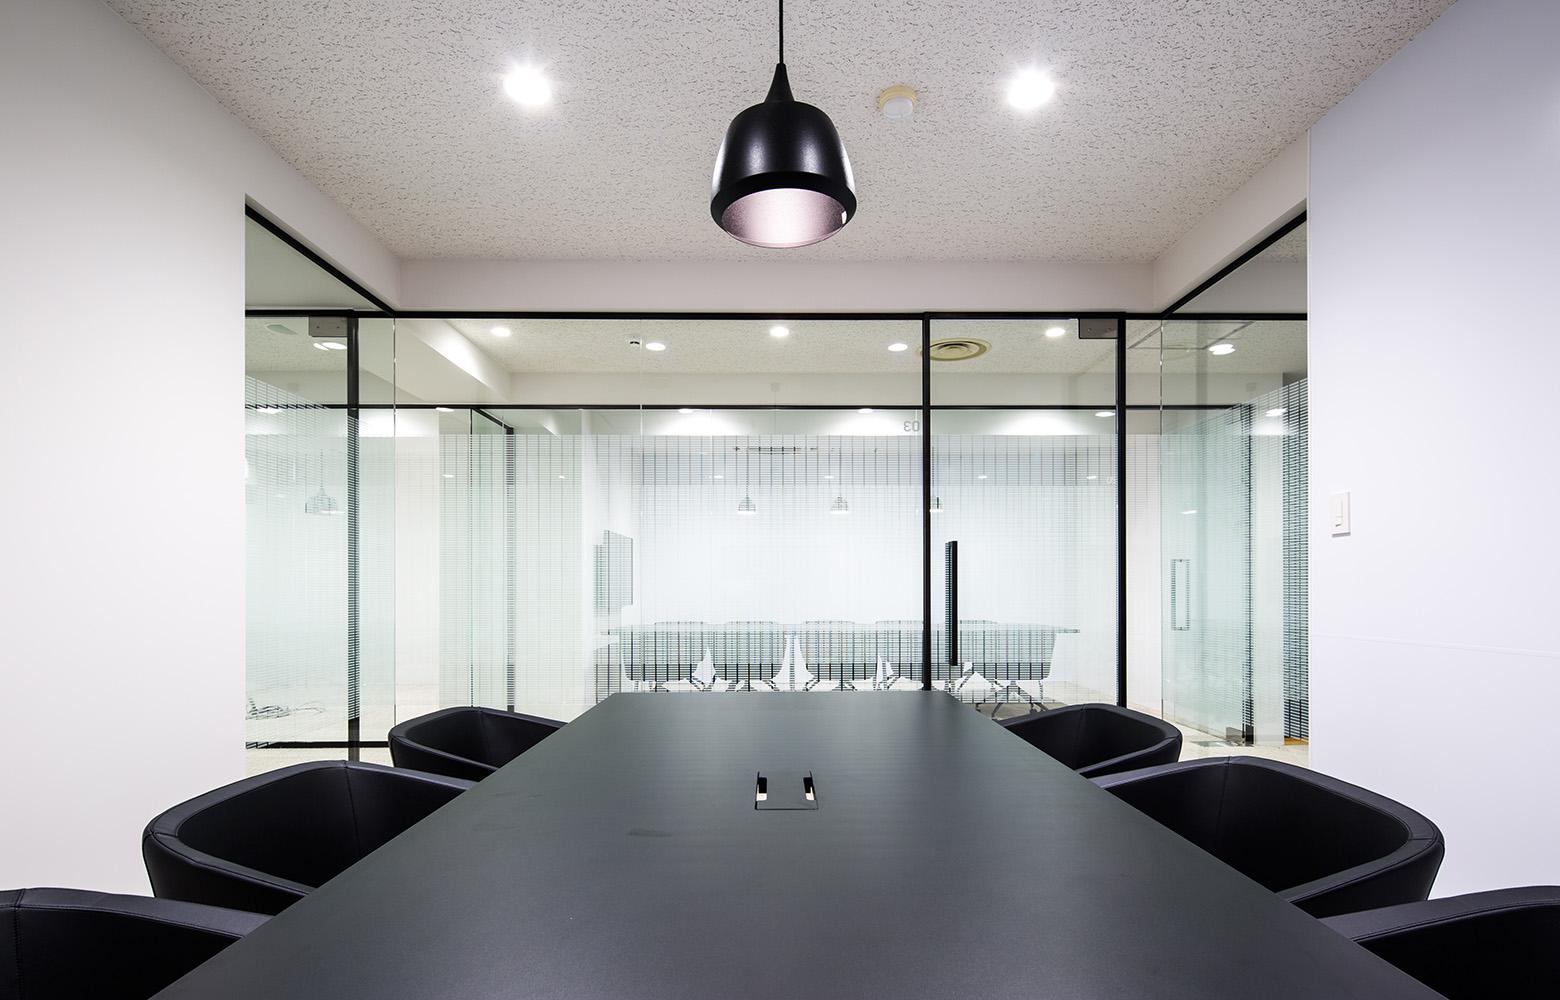 Secret Office Meeting Room デザイン・レイアウト事例